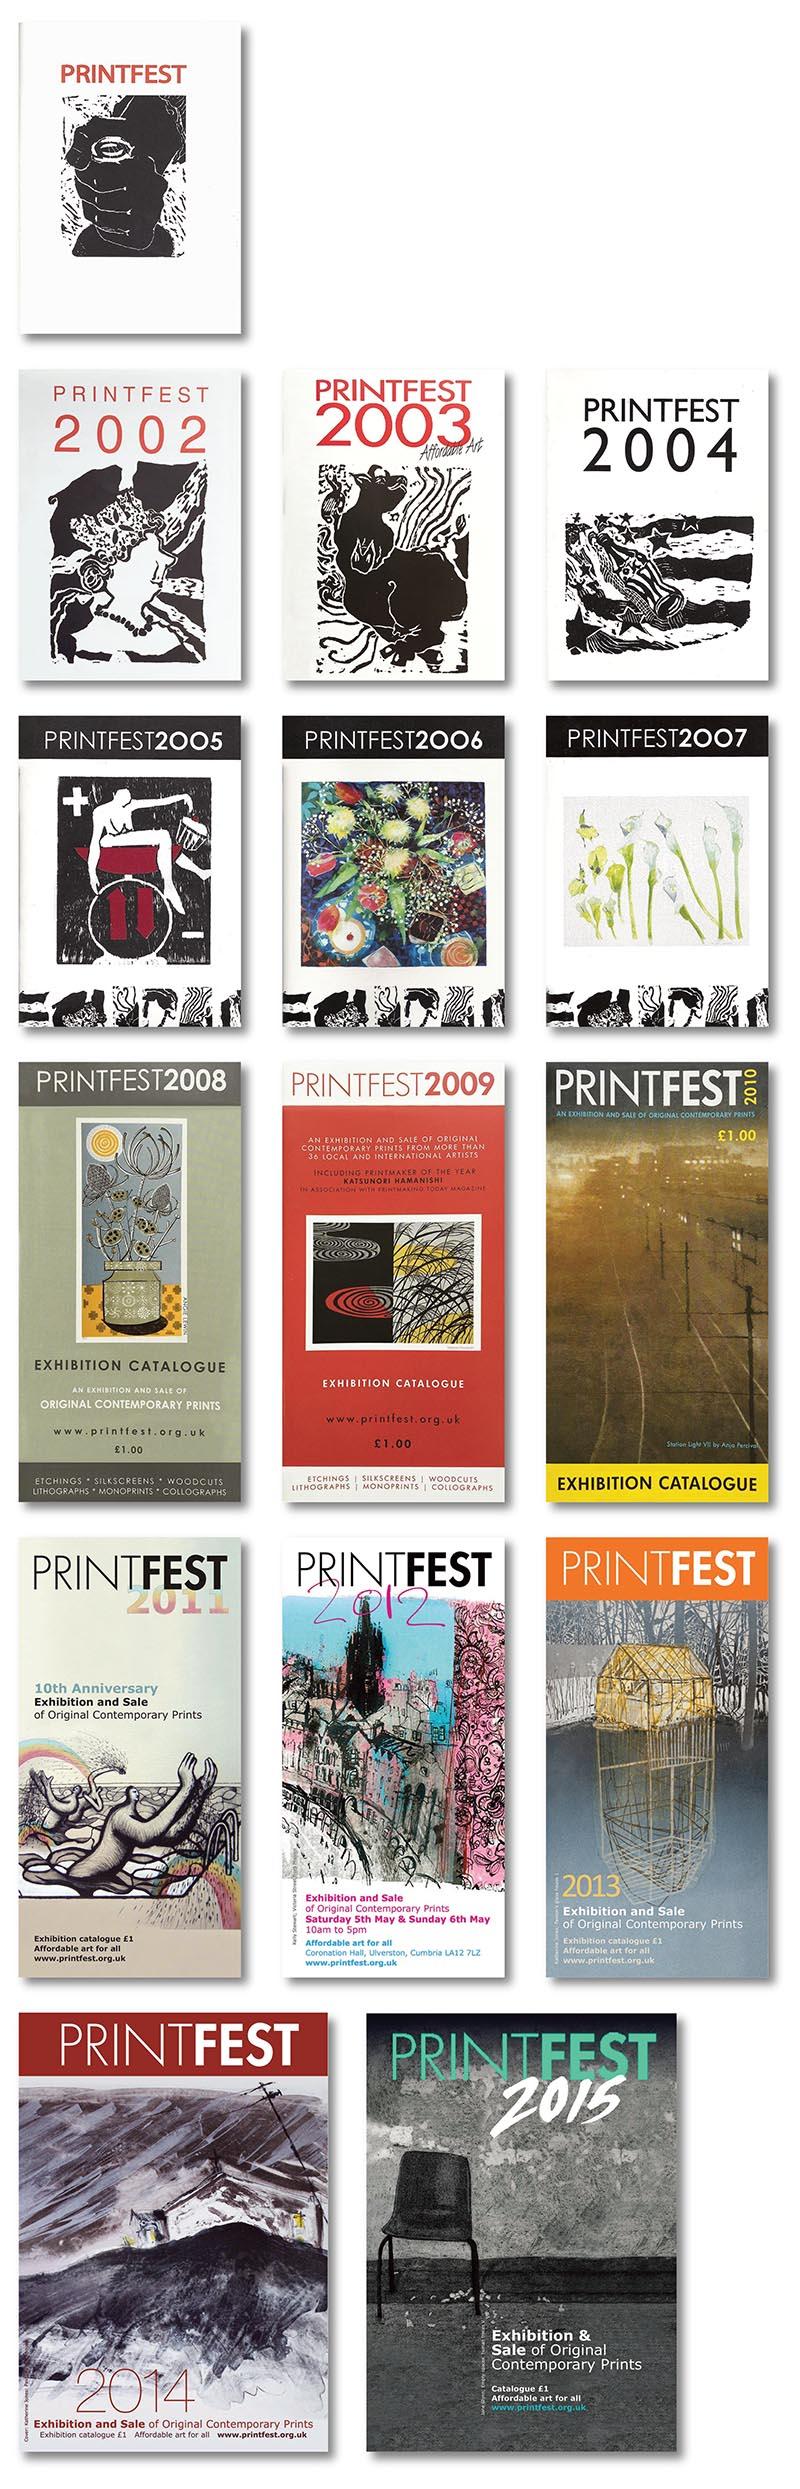 printfest archive